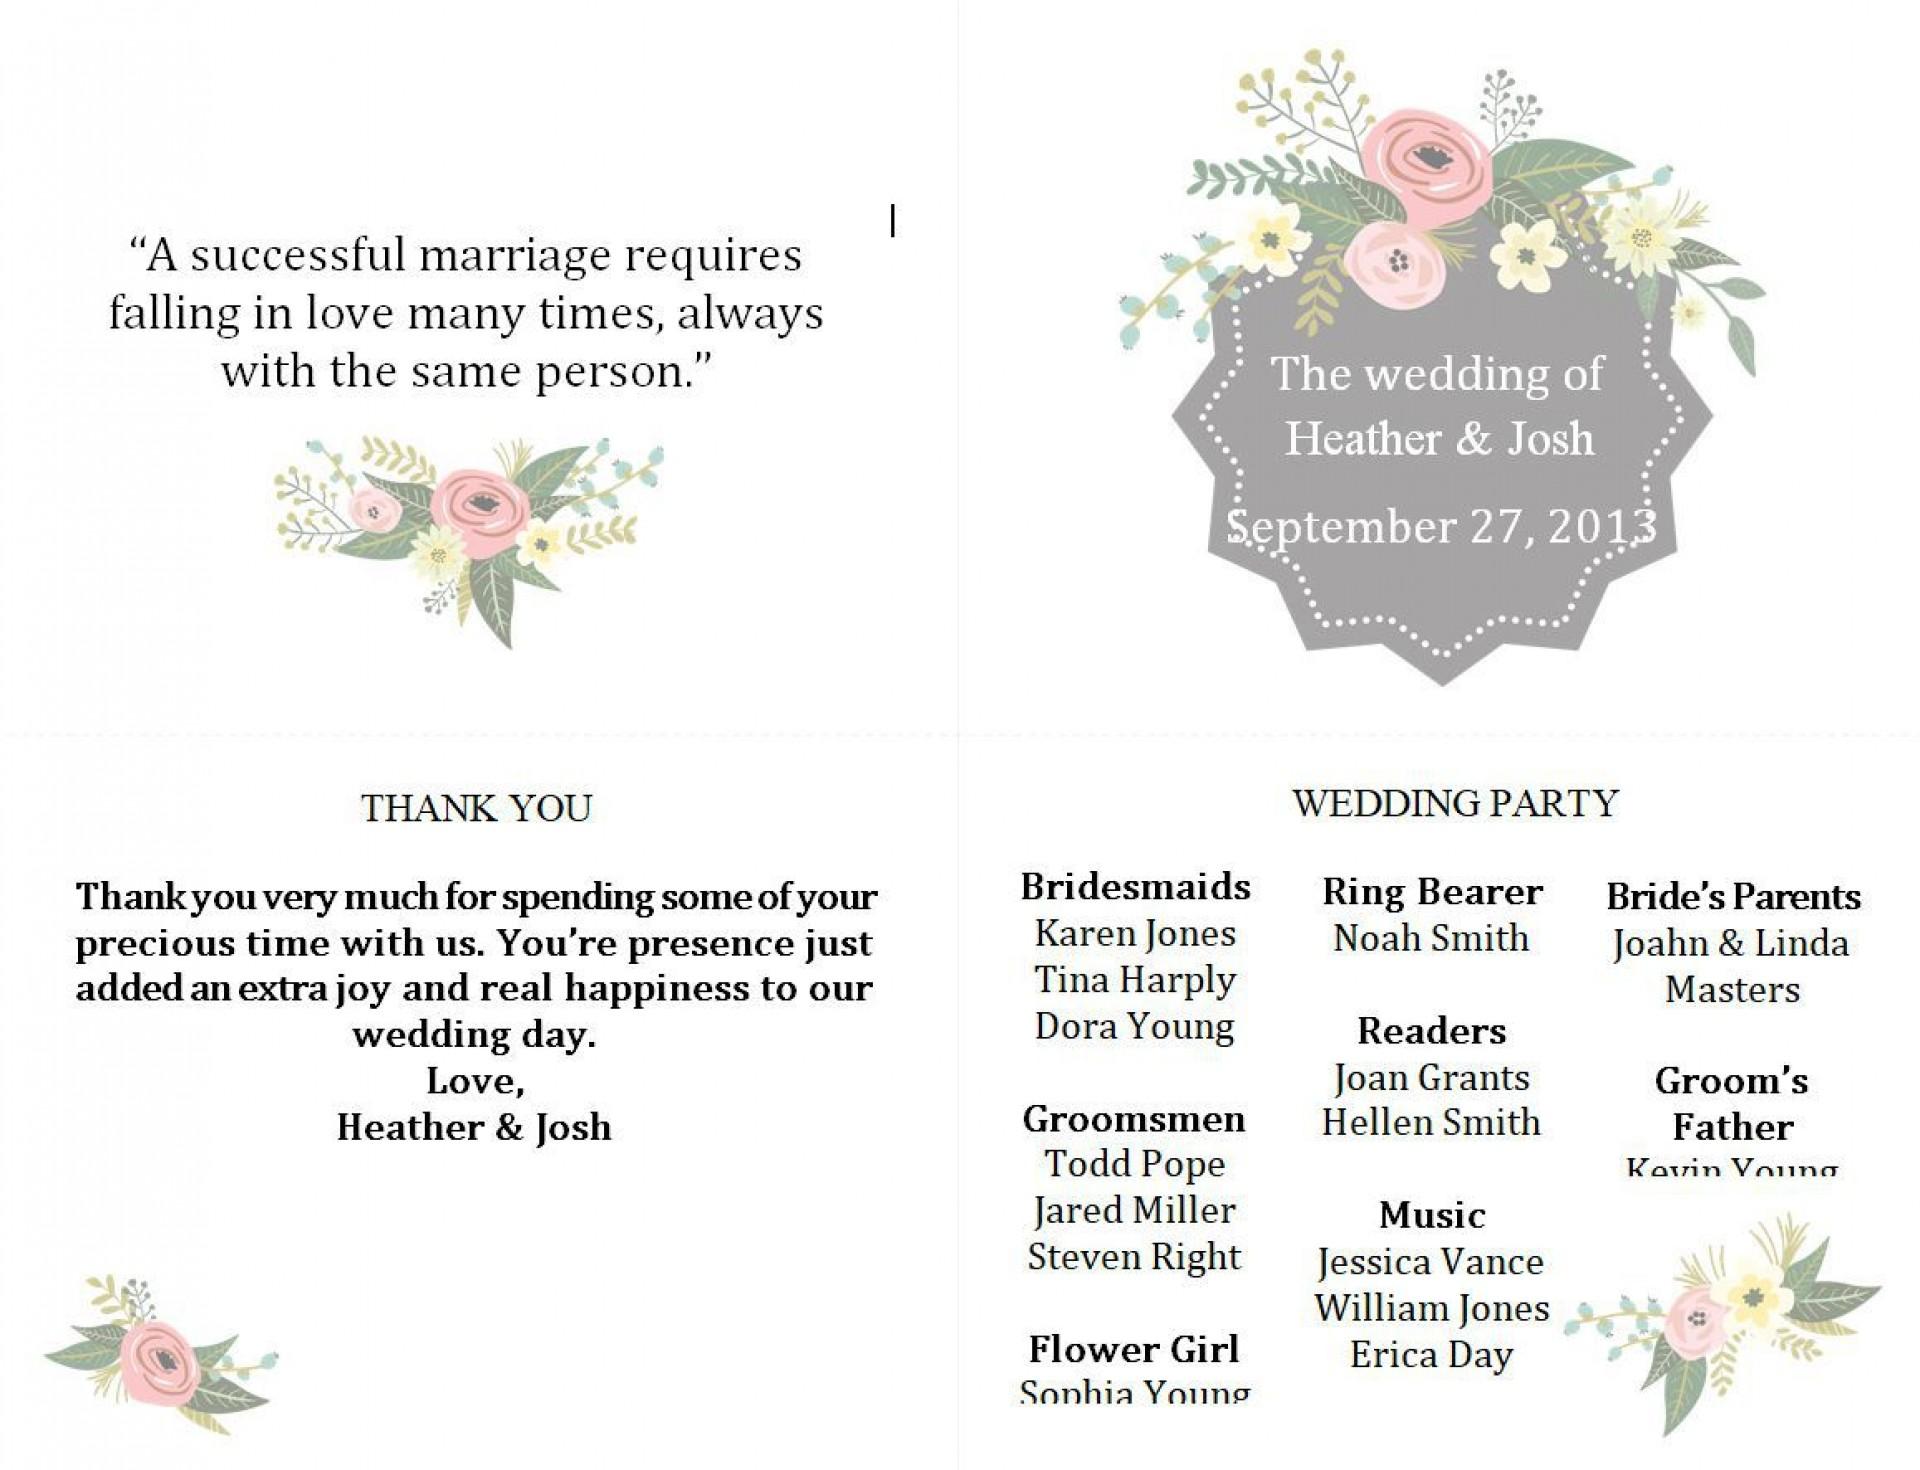 004 Breathtaking Free Wedding Program Template For Word Highest Clarity  Download Fan Microsoft Downloadable Reception1920